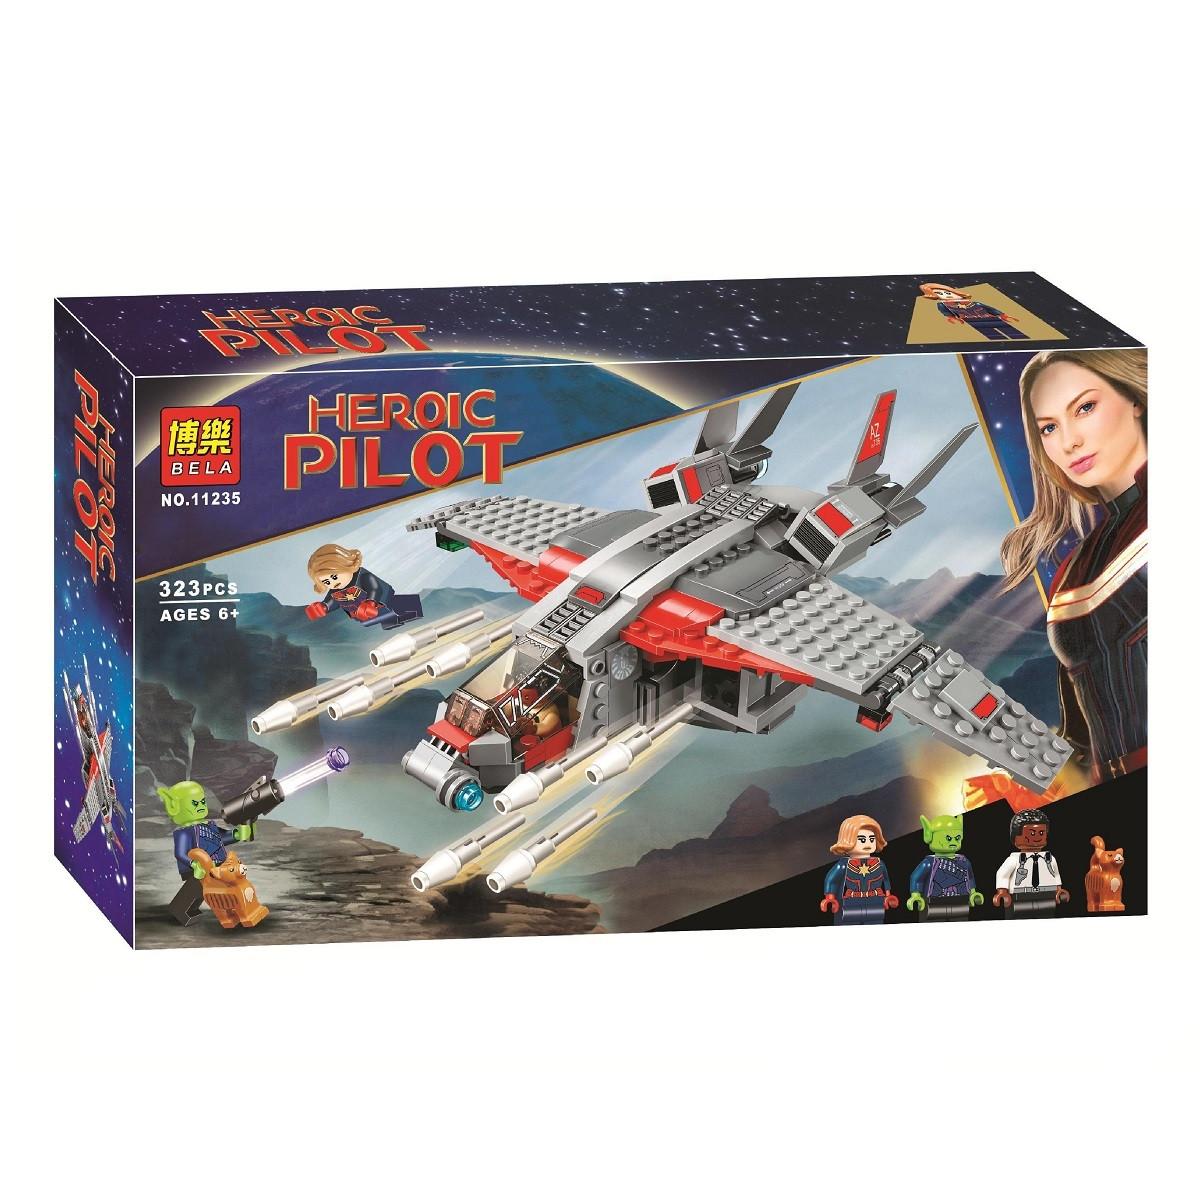 "Конструктор Super Heroes Bela 11235 ""Капитан Марвел и атака скруллов"", 323 дет"